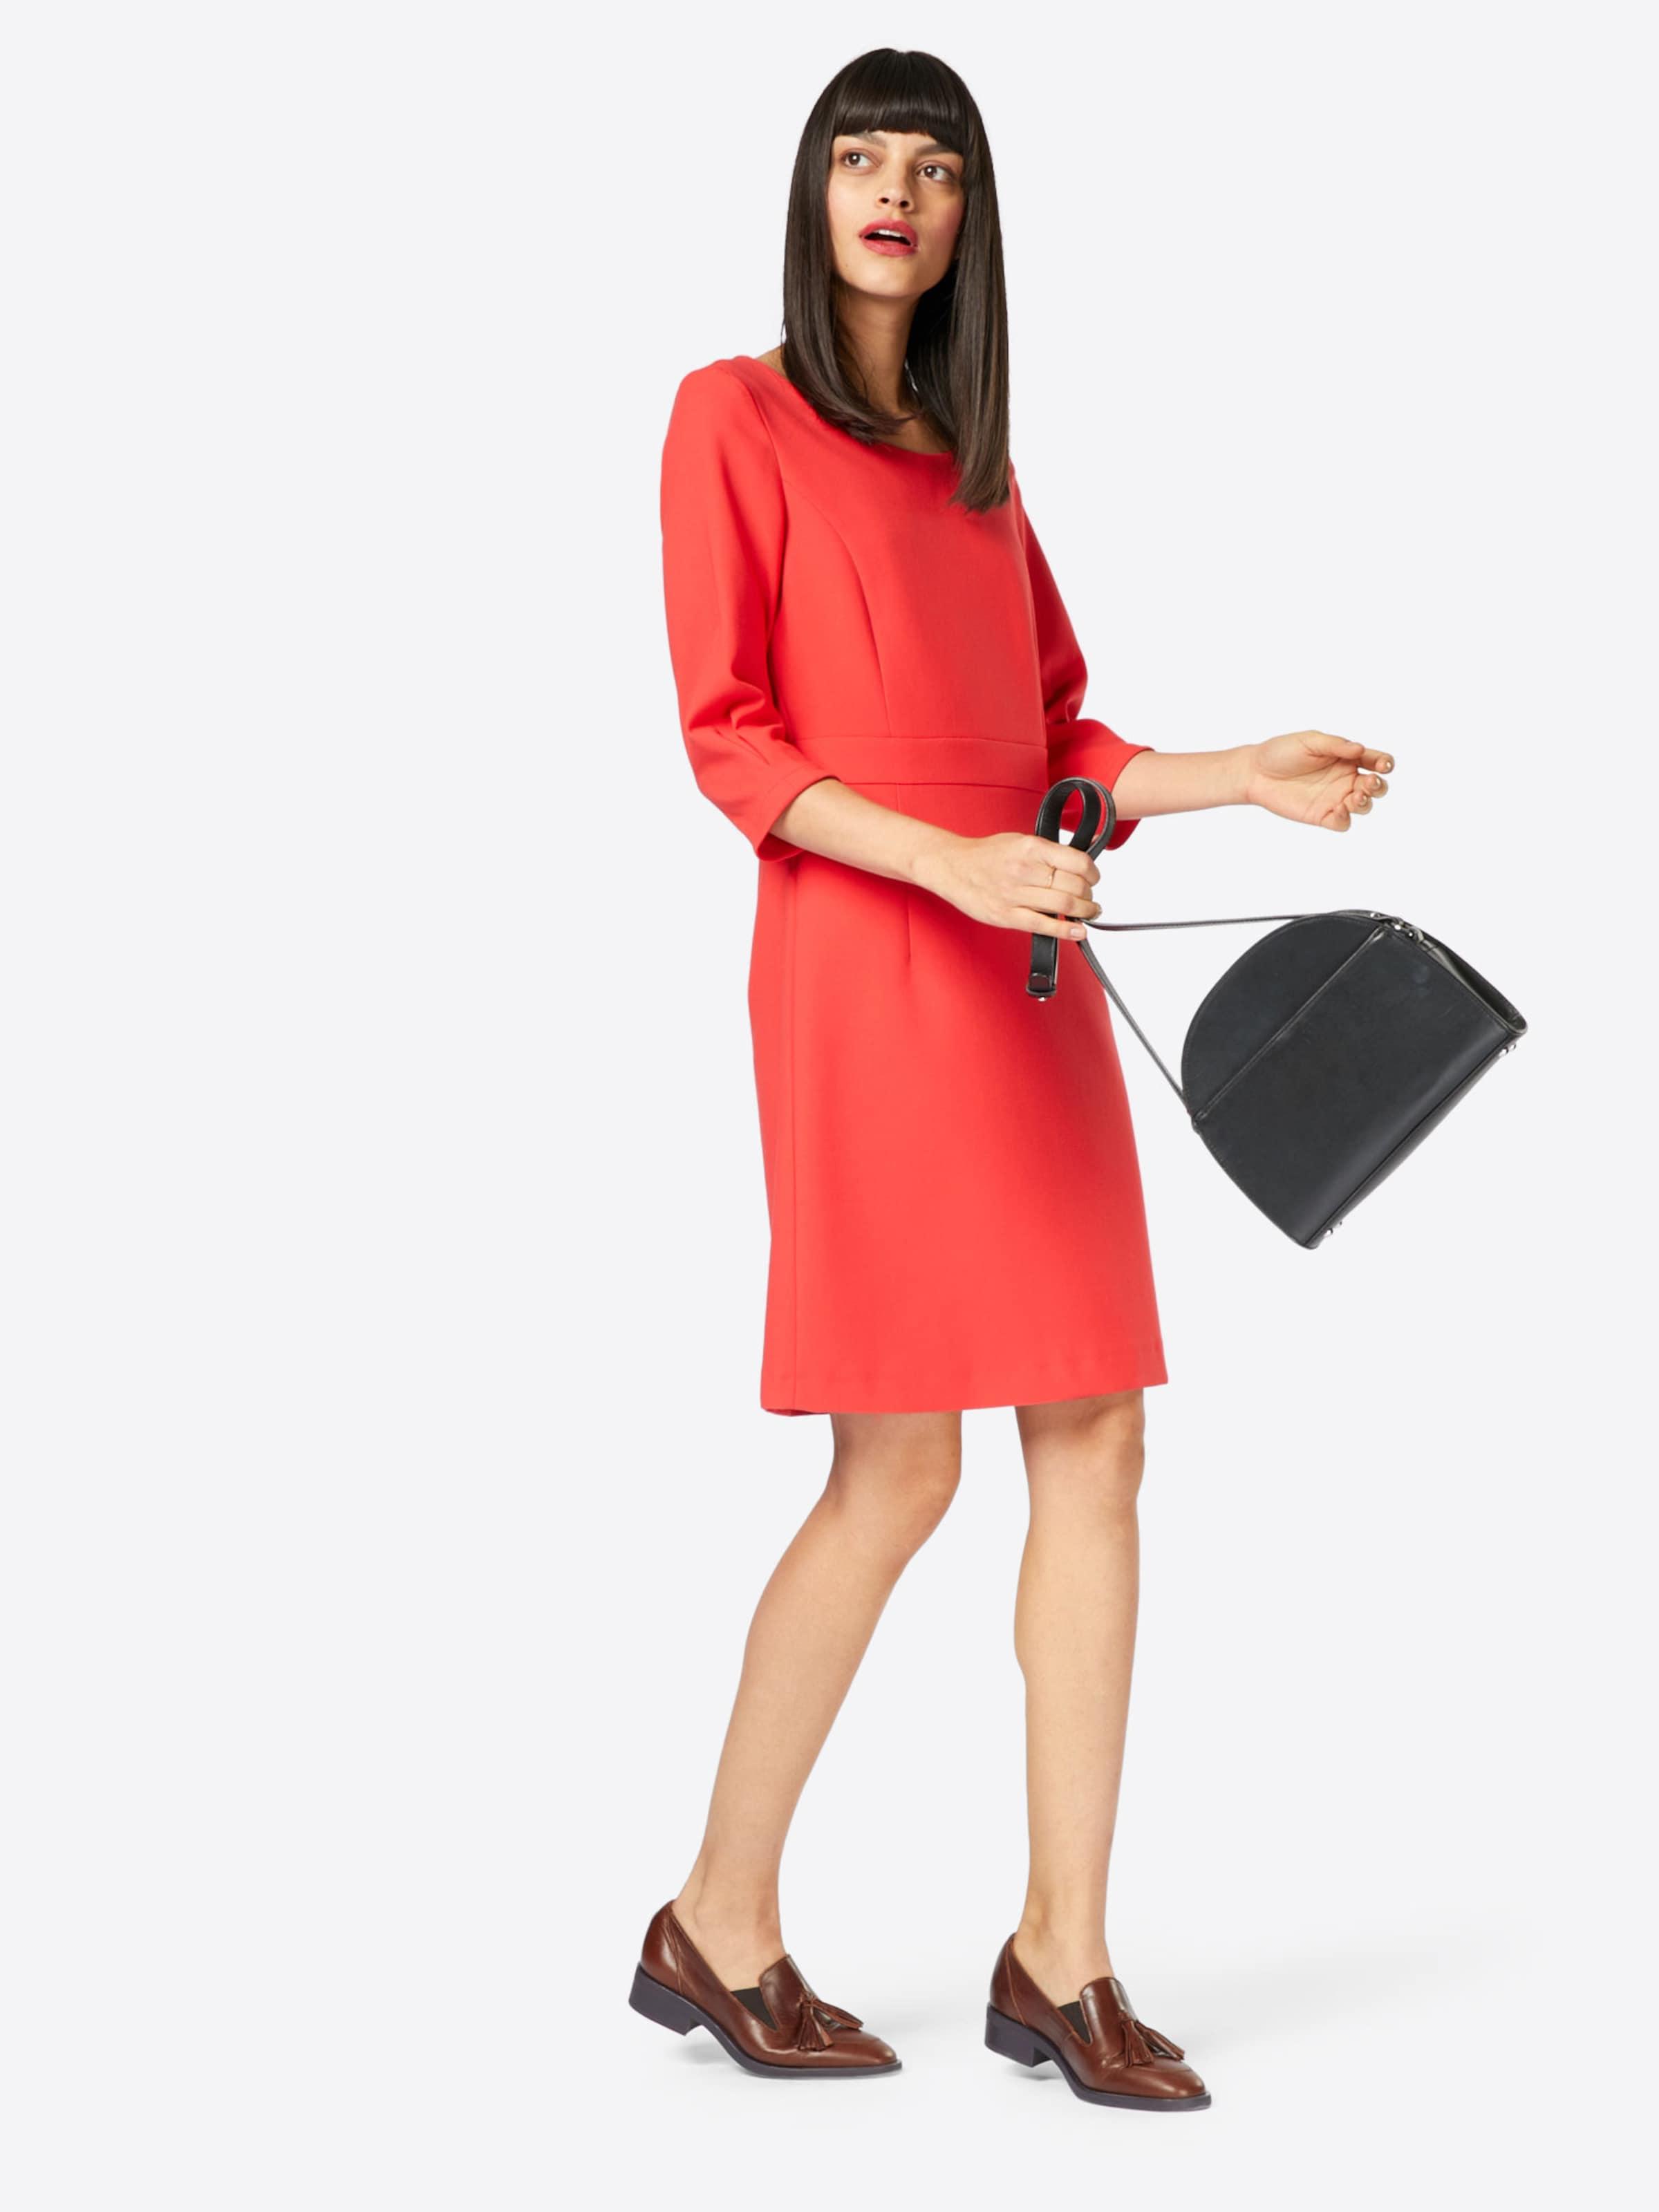 Top-Qualität Günstiger Preis Cool MORE & MORE Casual Kleid Rabatt Niedriger Versand GleBN9